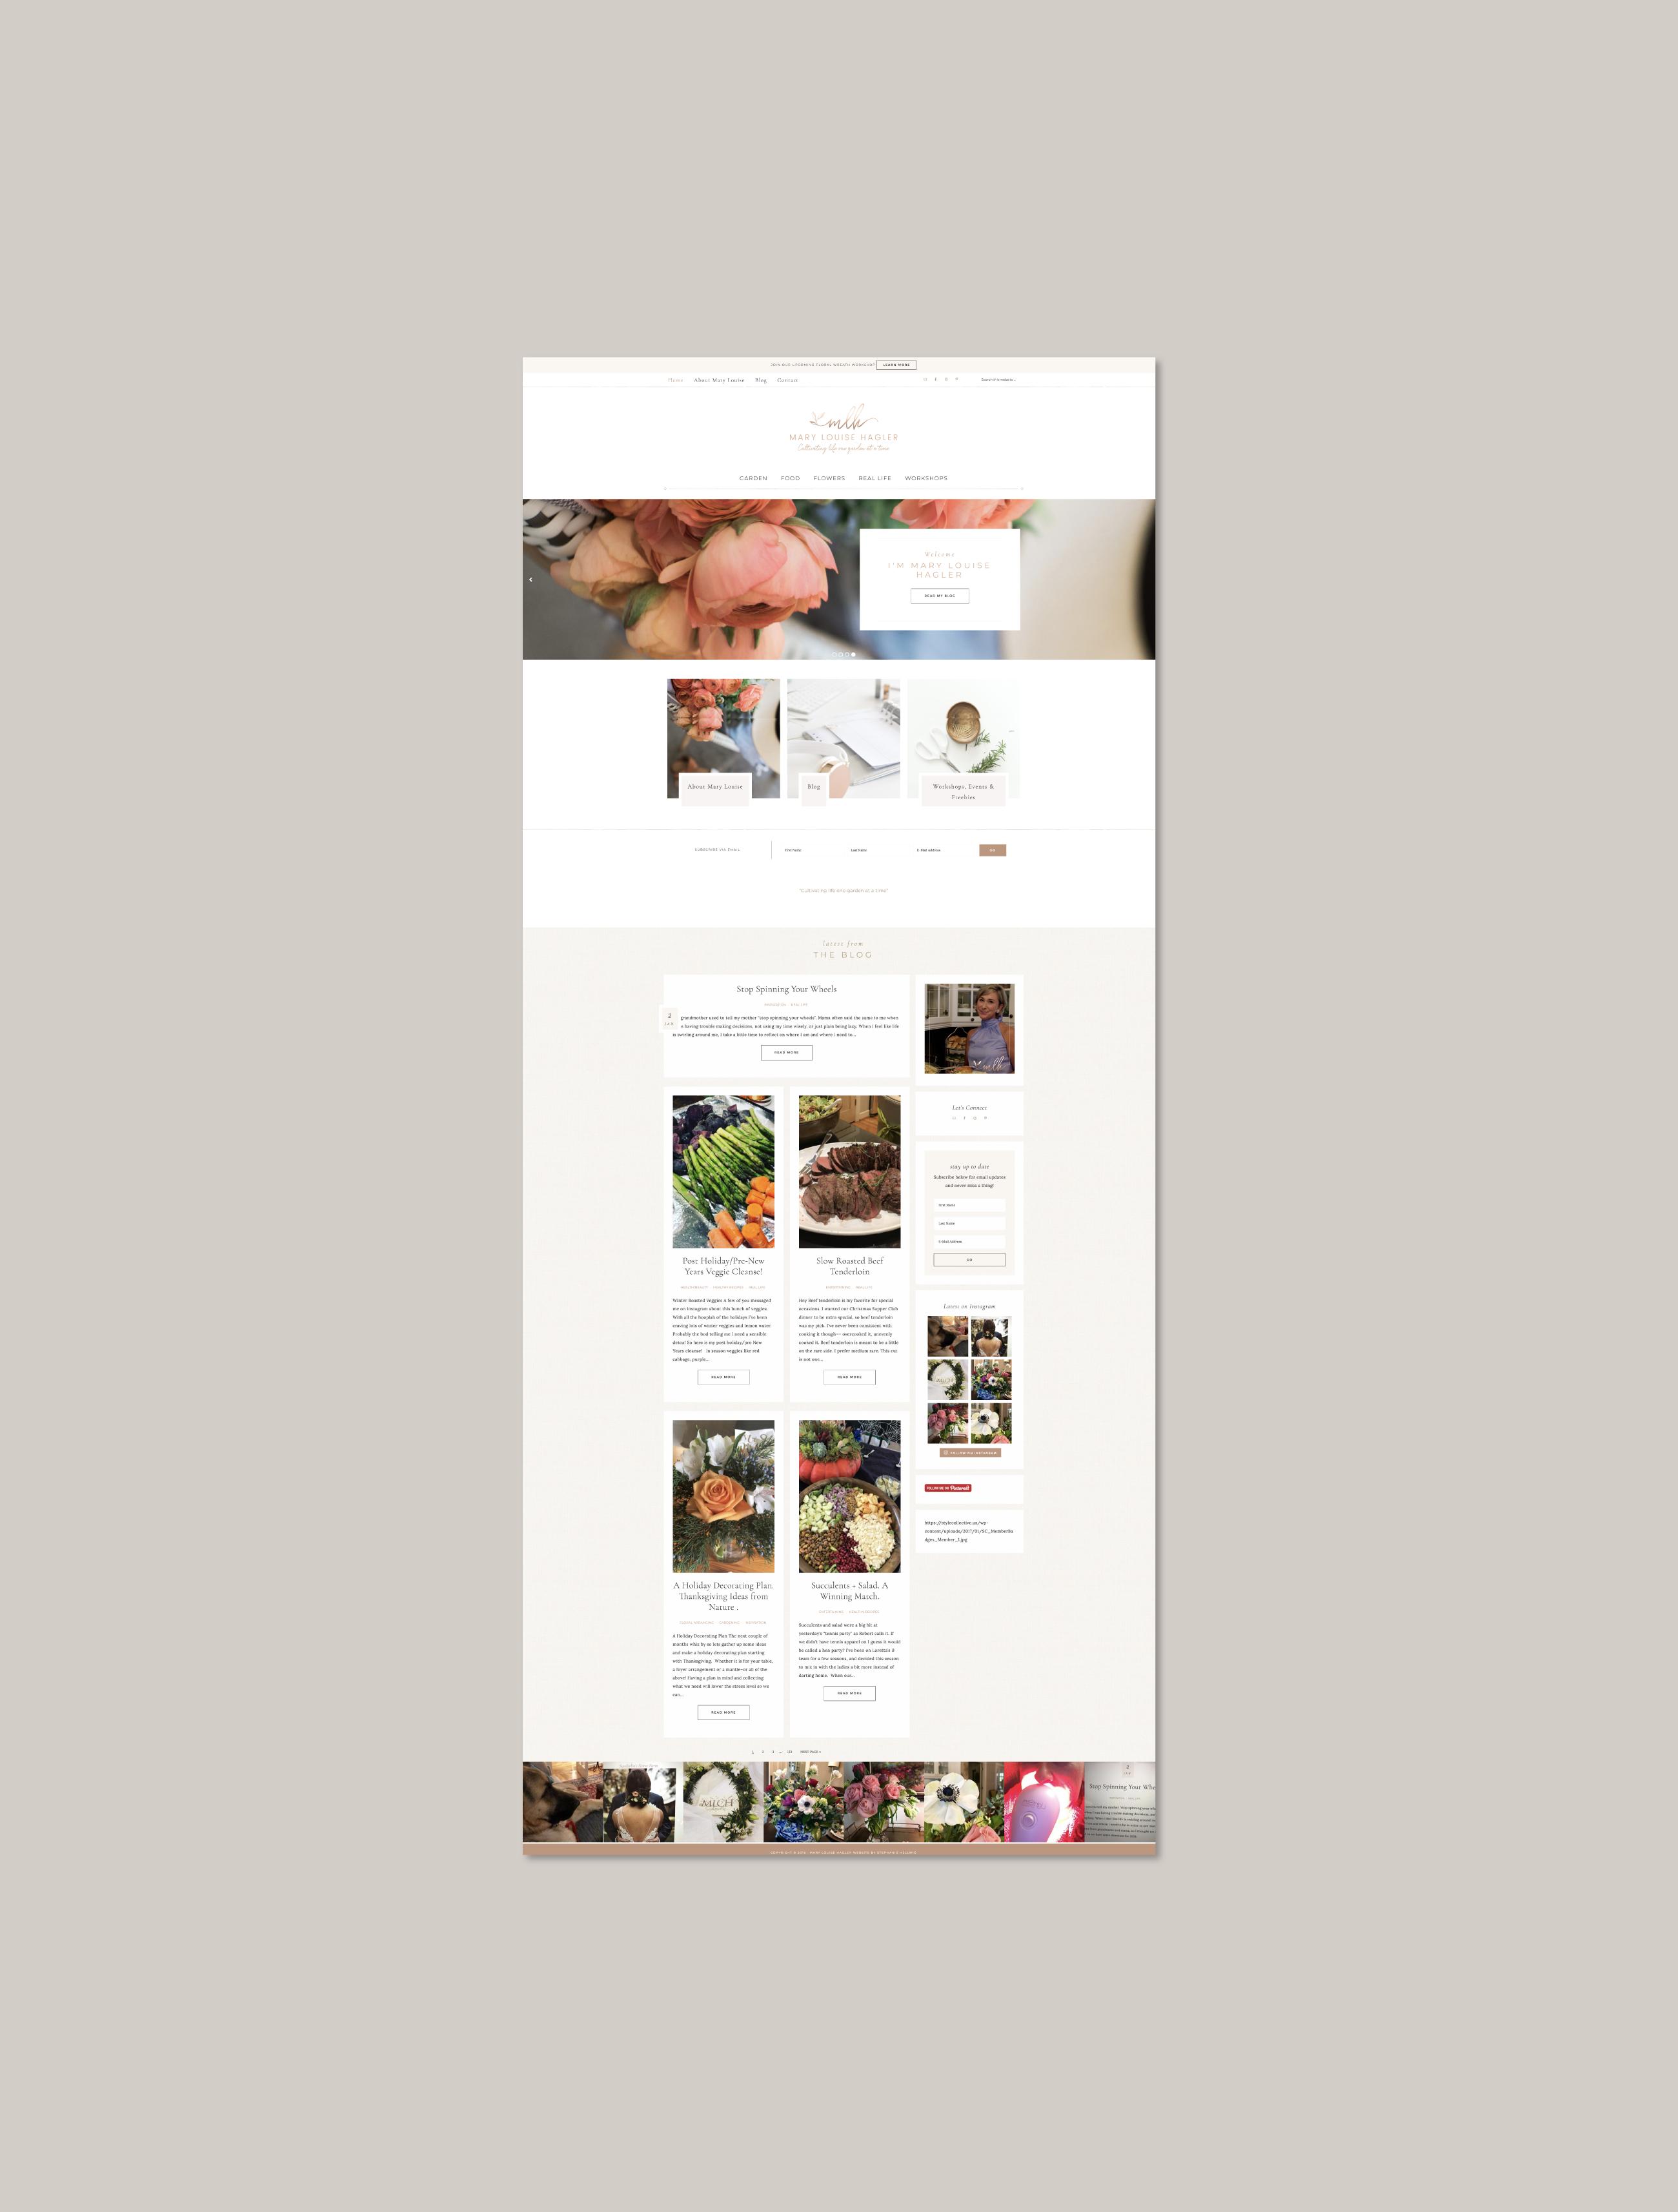 Custom design services stephaniehellwig for Custom design services